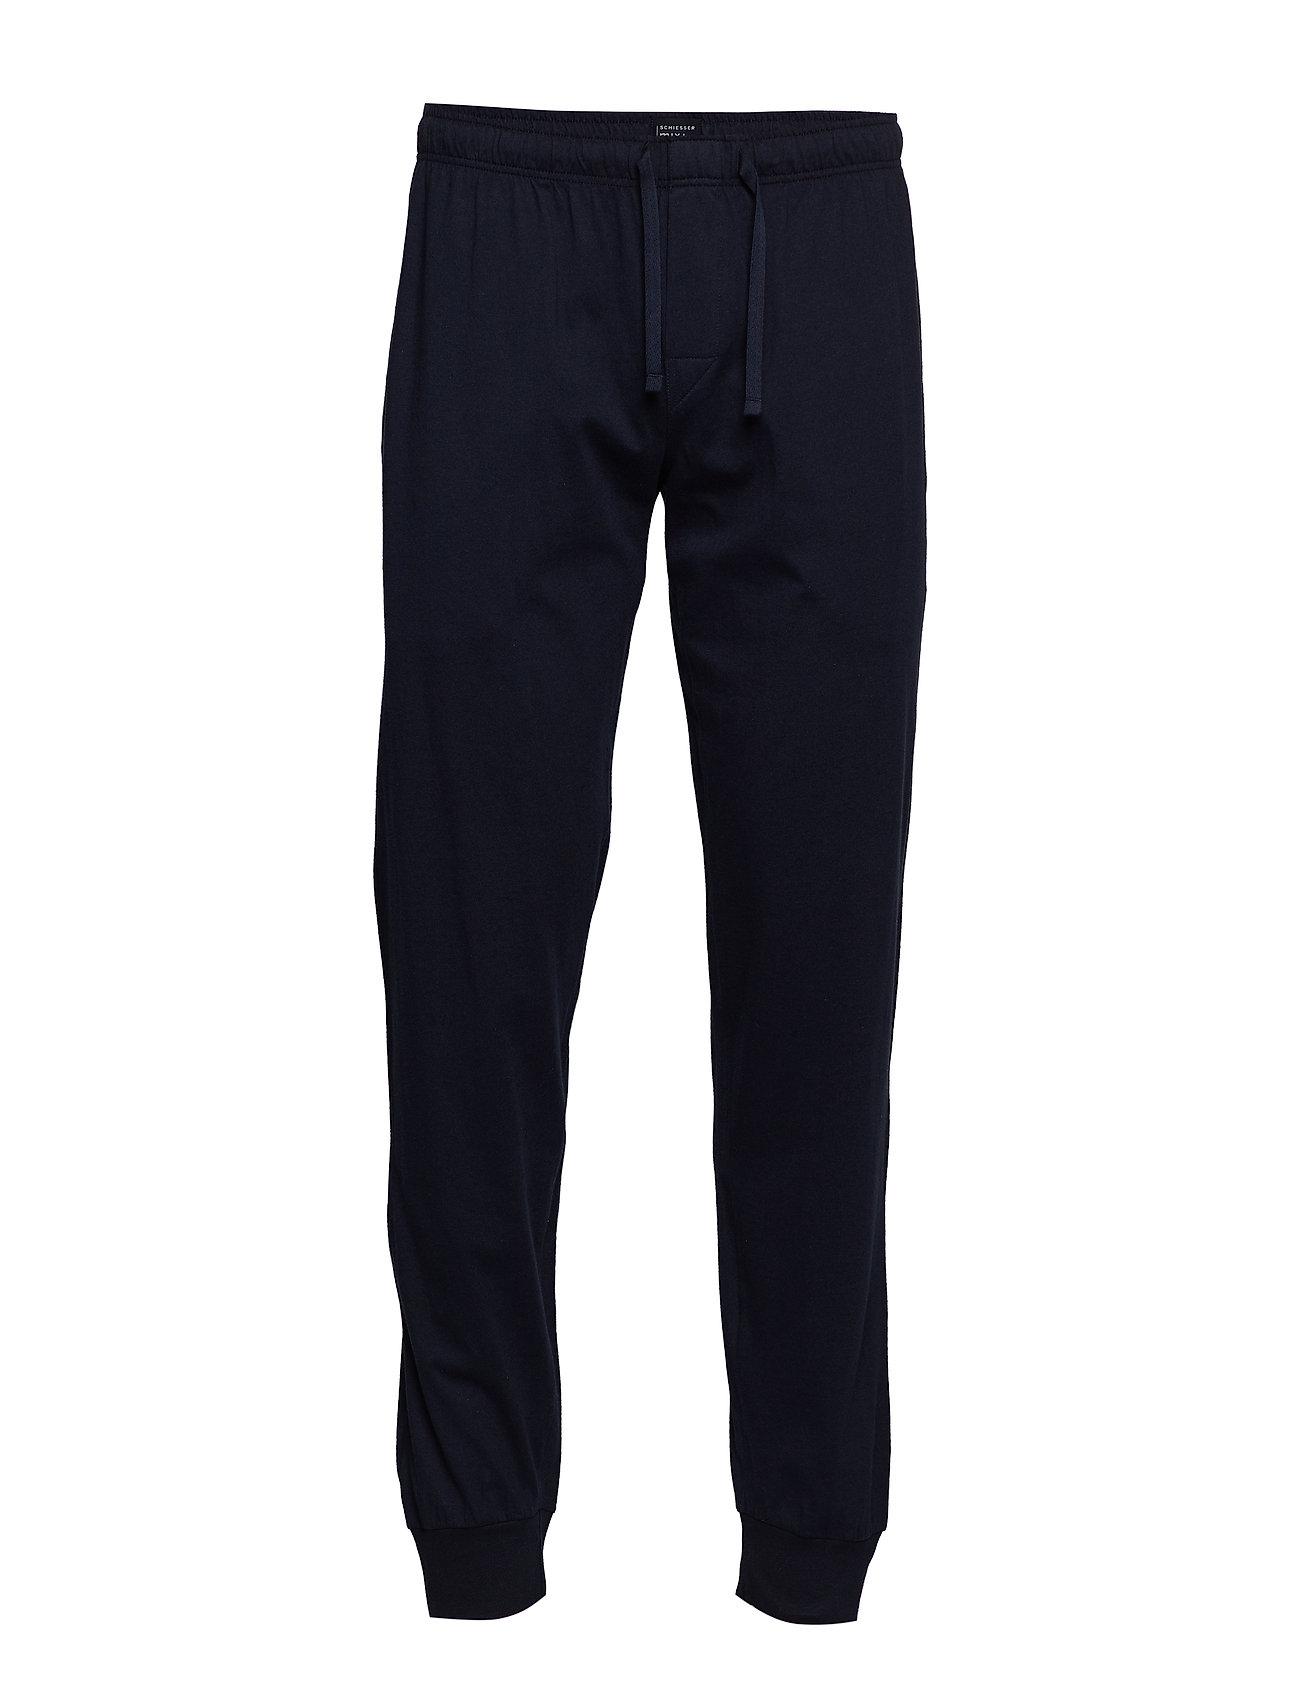 Image of Long Pants Hyggebukser Blå Schiesser (3134854651)